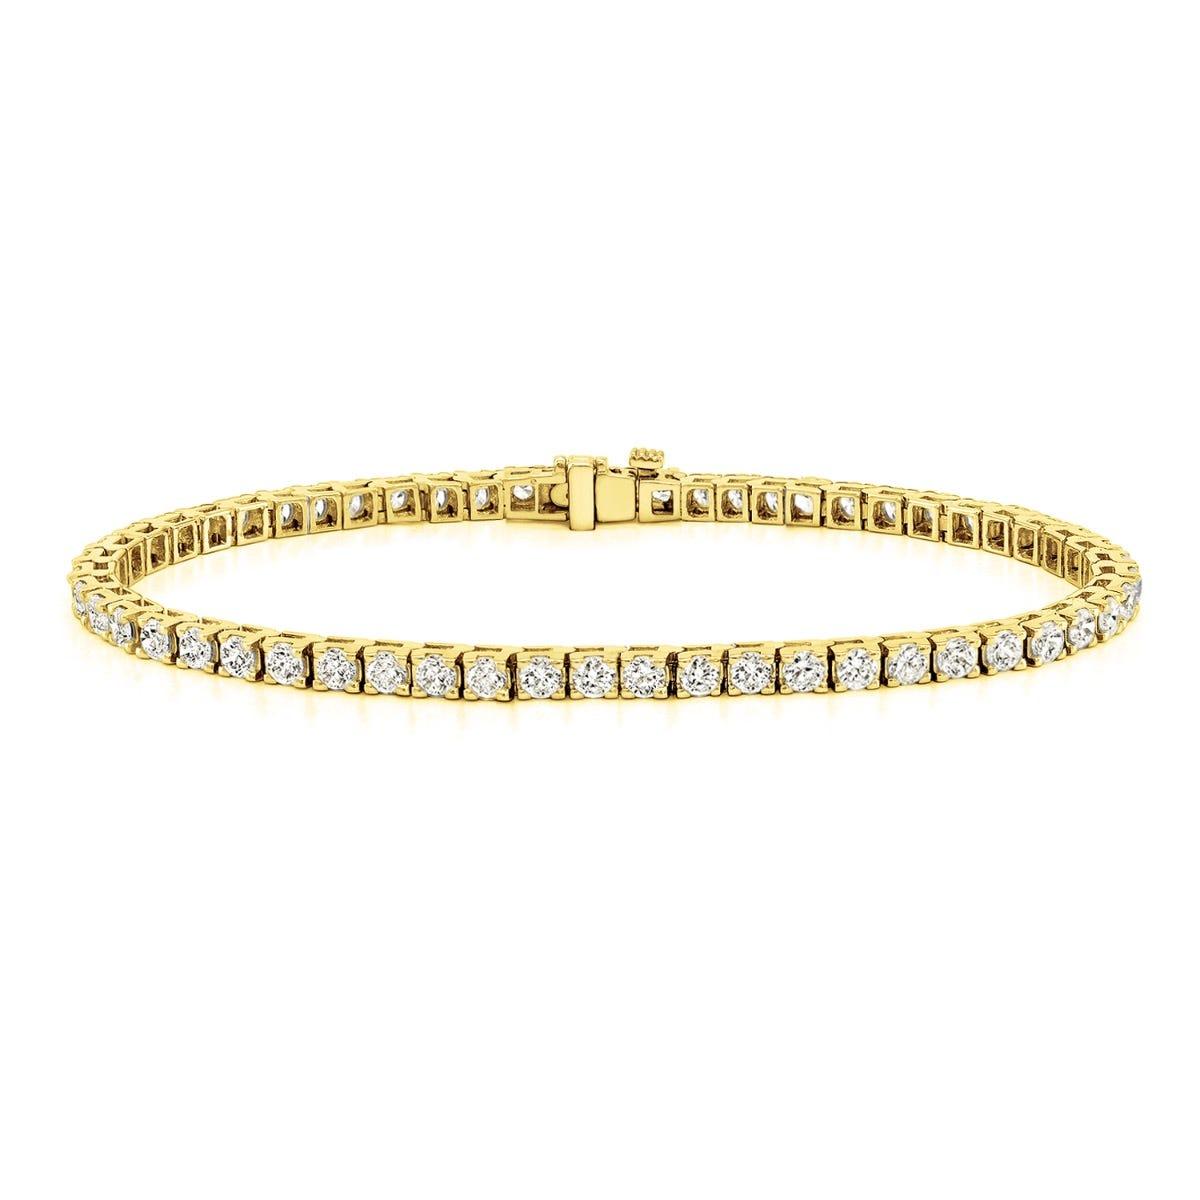 2.50ctw. 4-Prong Square Link Diamond Tennis Bracelet in 14K Yellow Gold (JK, I2-I3)